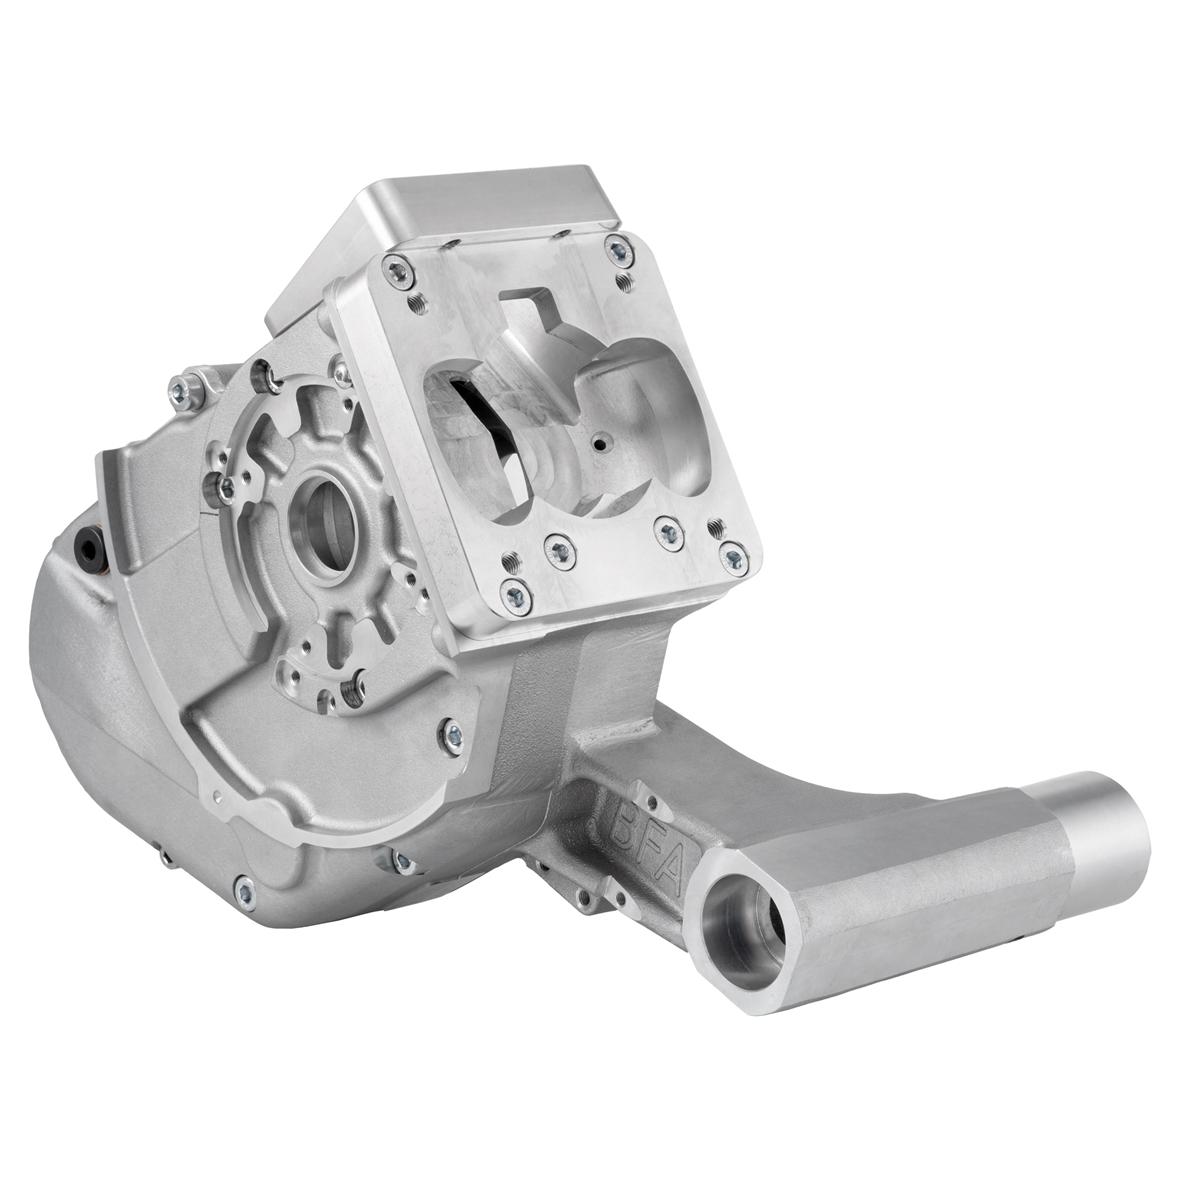 Product Image for 'Crankcase BFA MOTORI, Aprilia typeTitle'